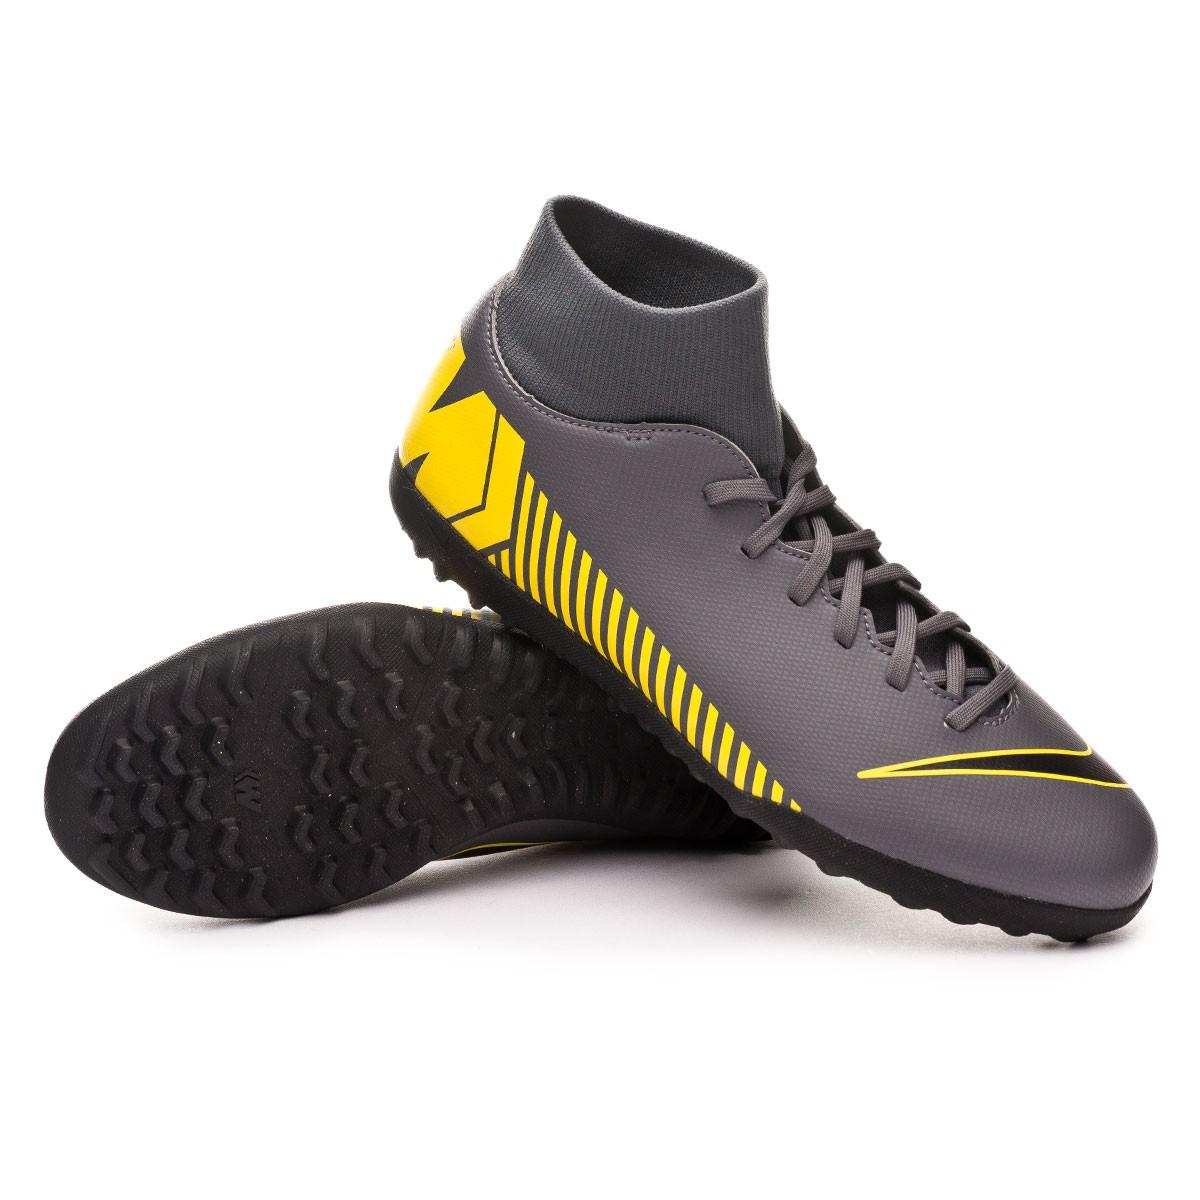 4b4c8b28157 Football Boot Nike Mercurial SuperflyX VI Club Turf Dark grey-Black-Optical  yellow - Football store Fútbol Emotion